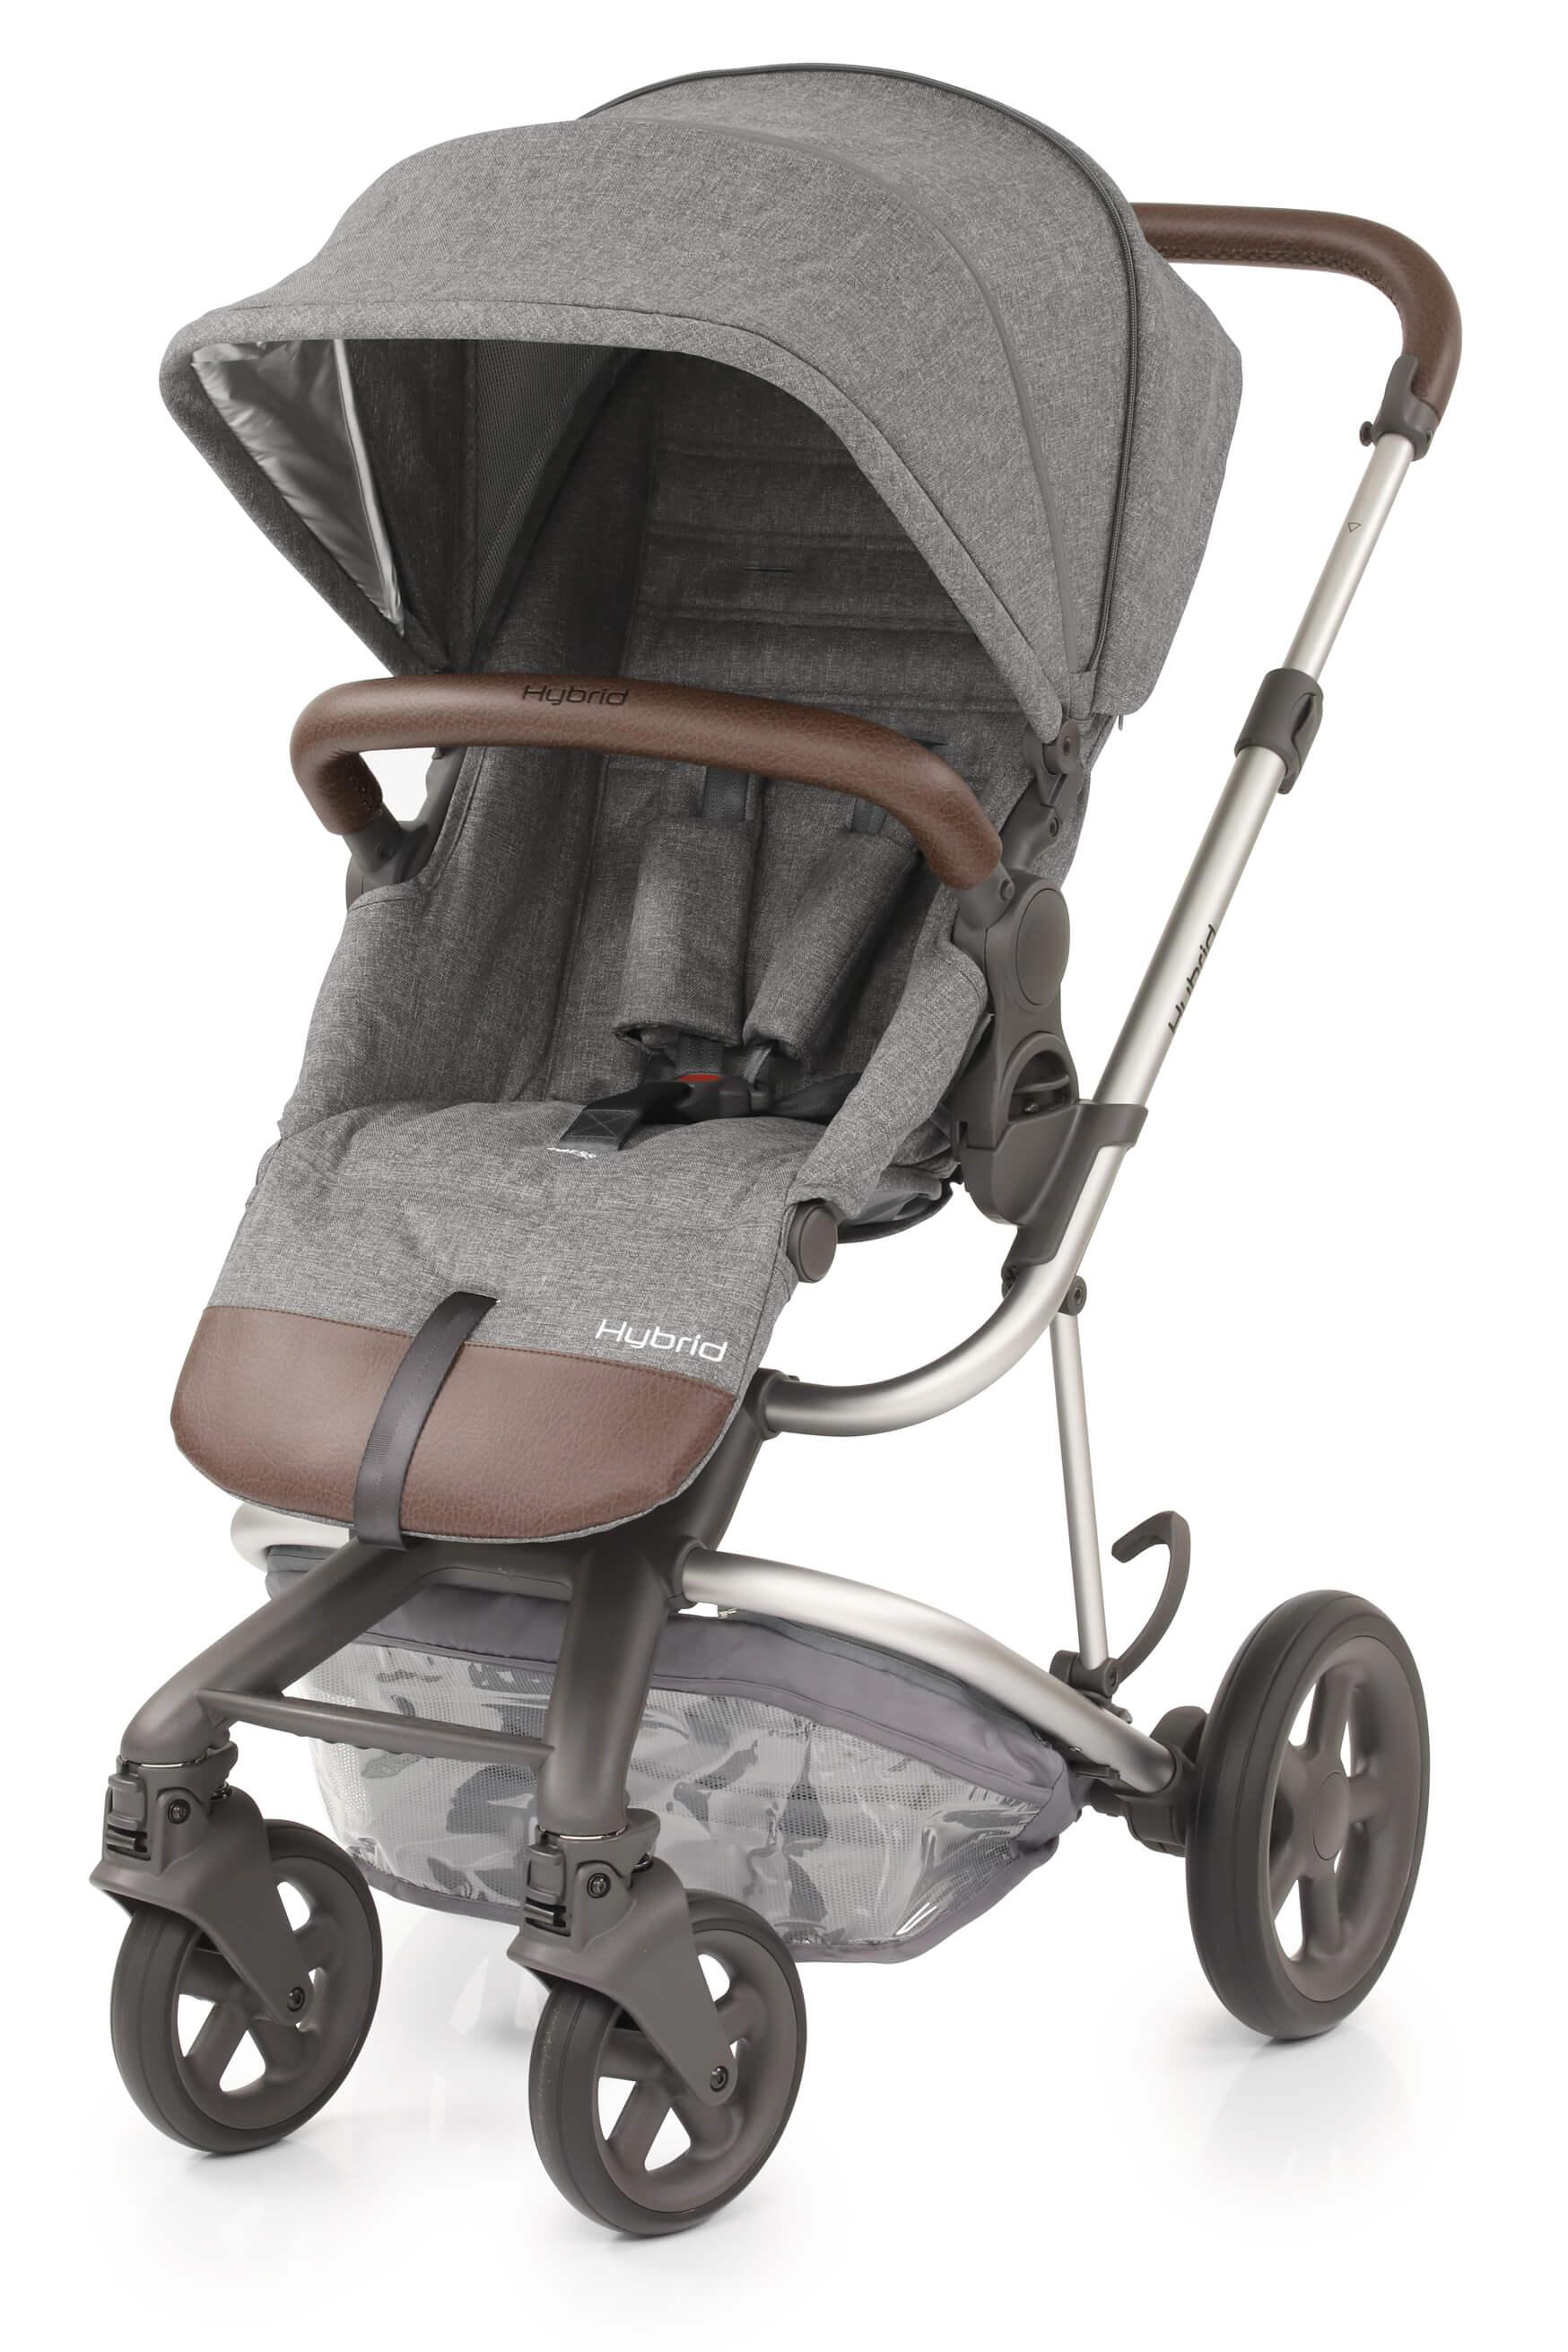 BabyStyle Hybrid Stroller